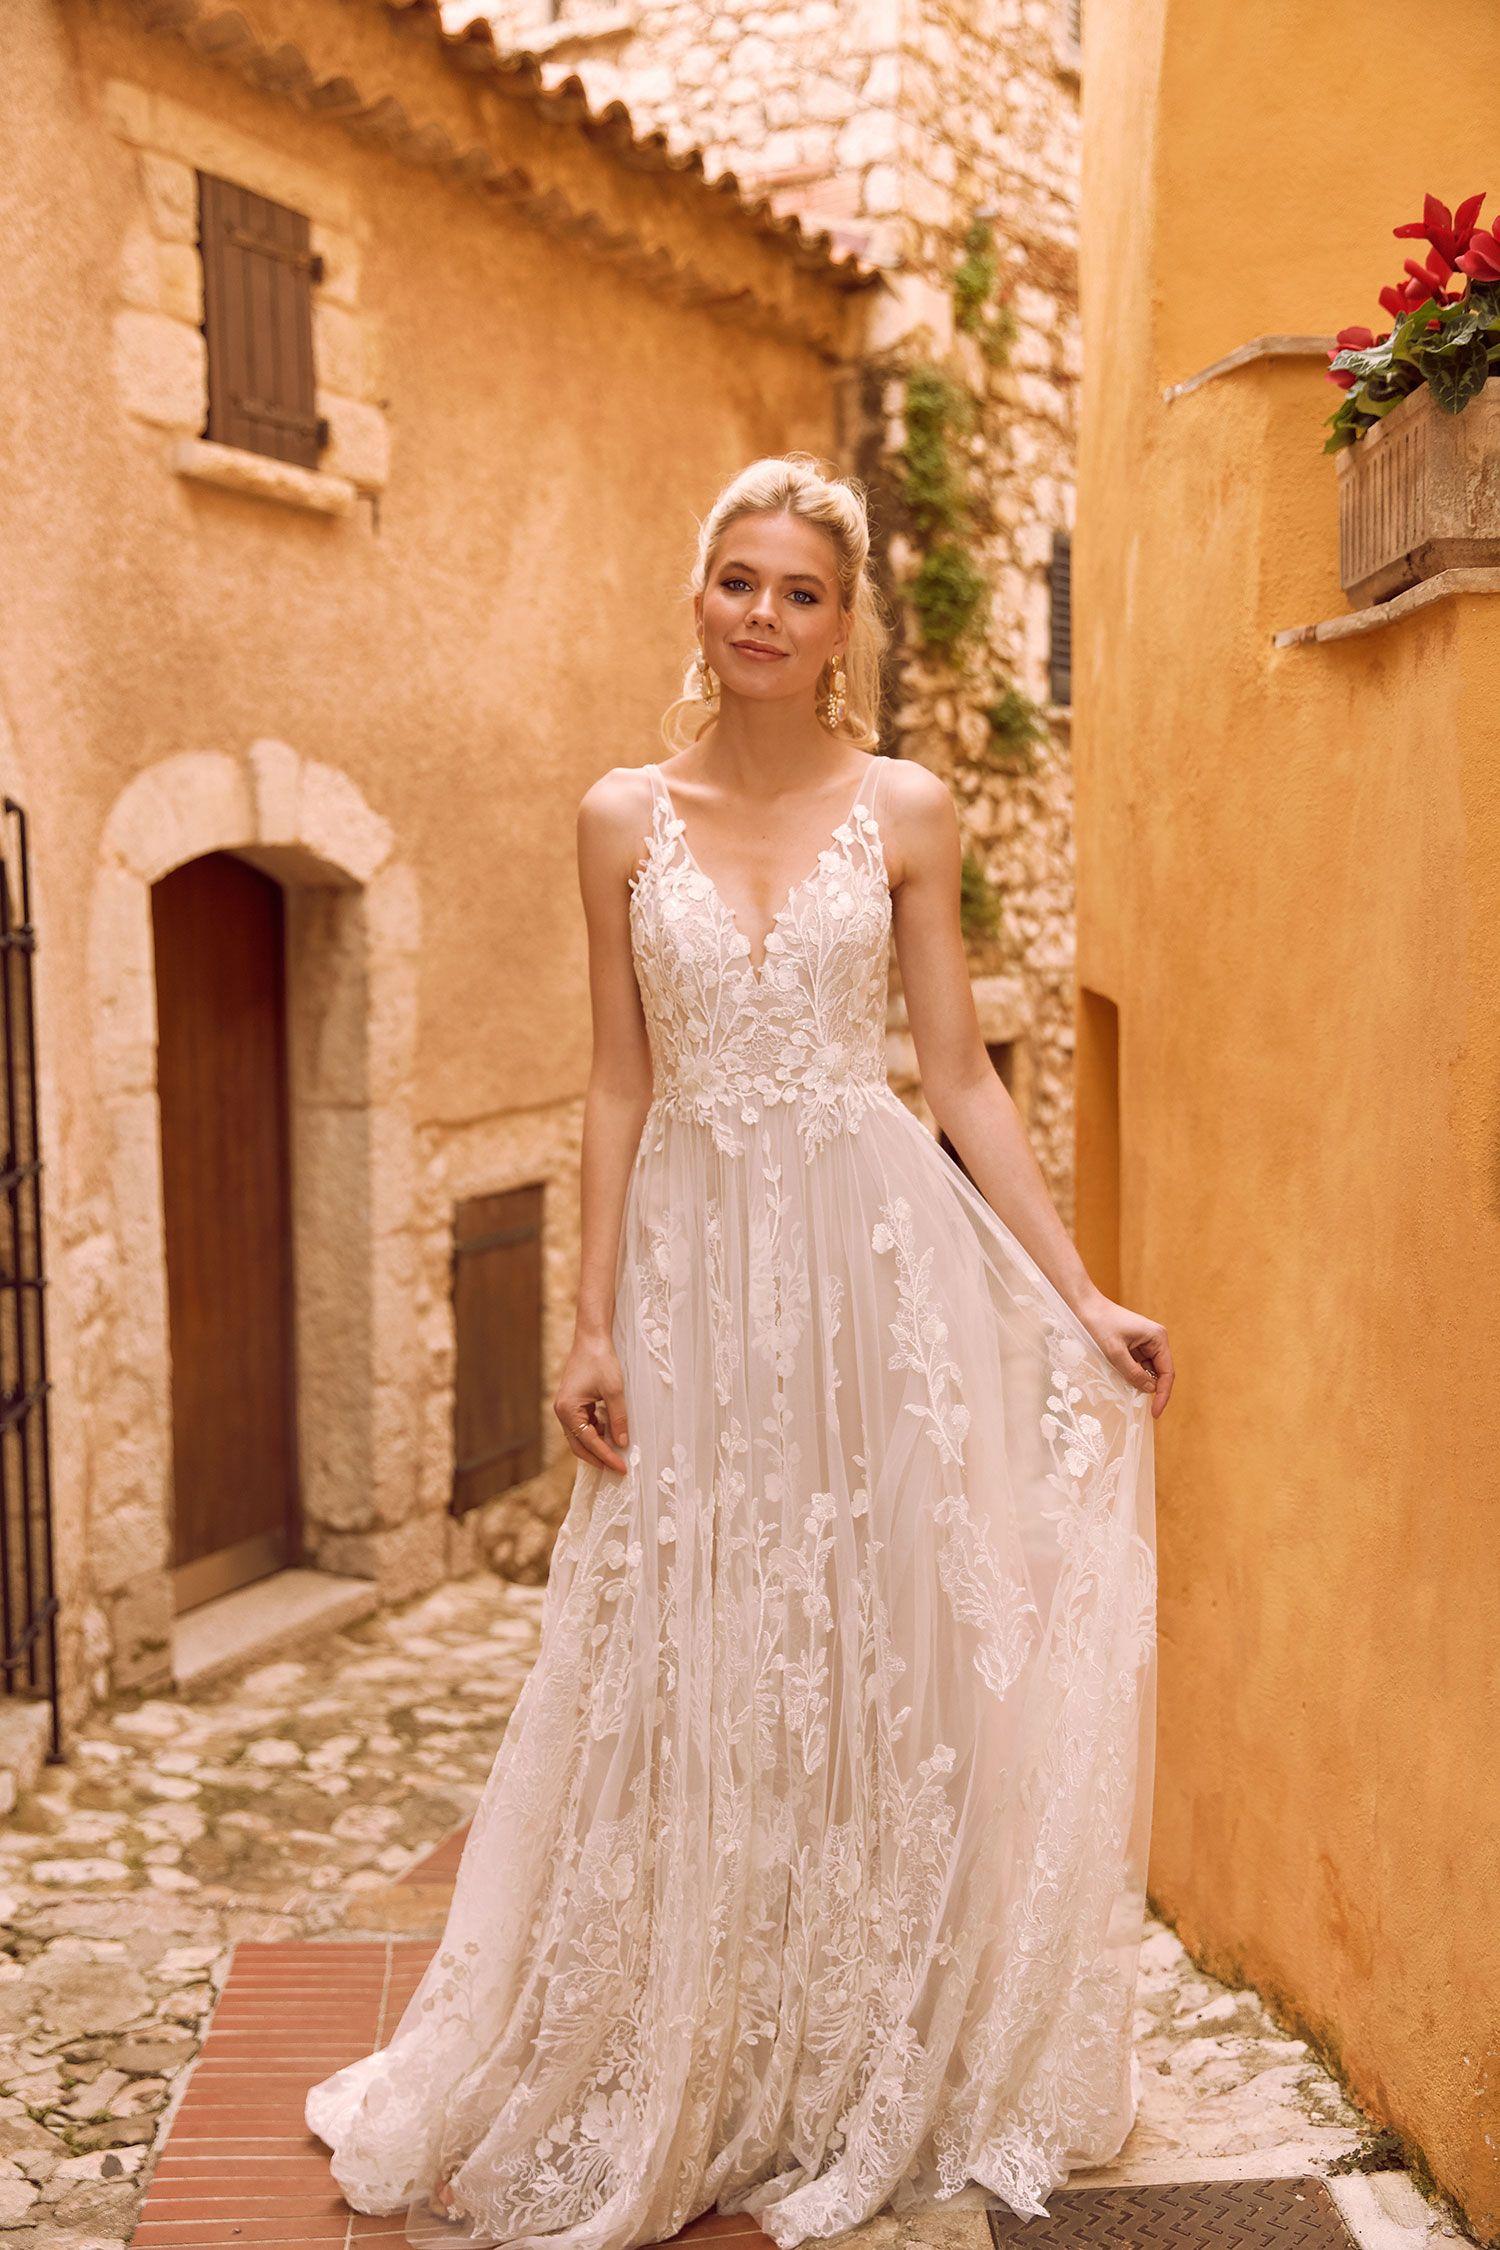 Harper In 2020 Wedding Dresses Lace Weddings Wedding Dress